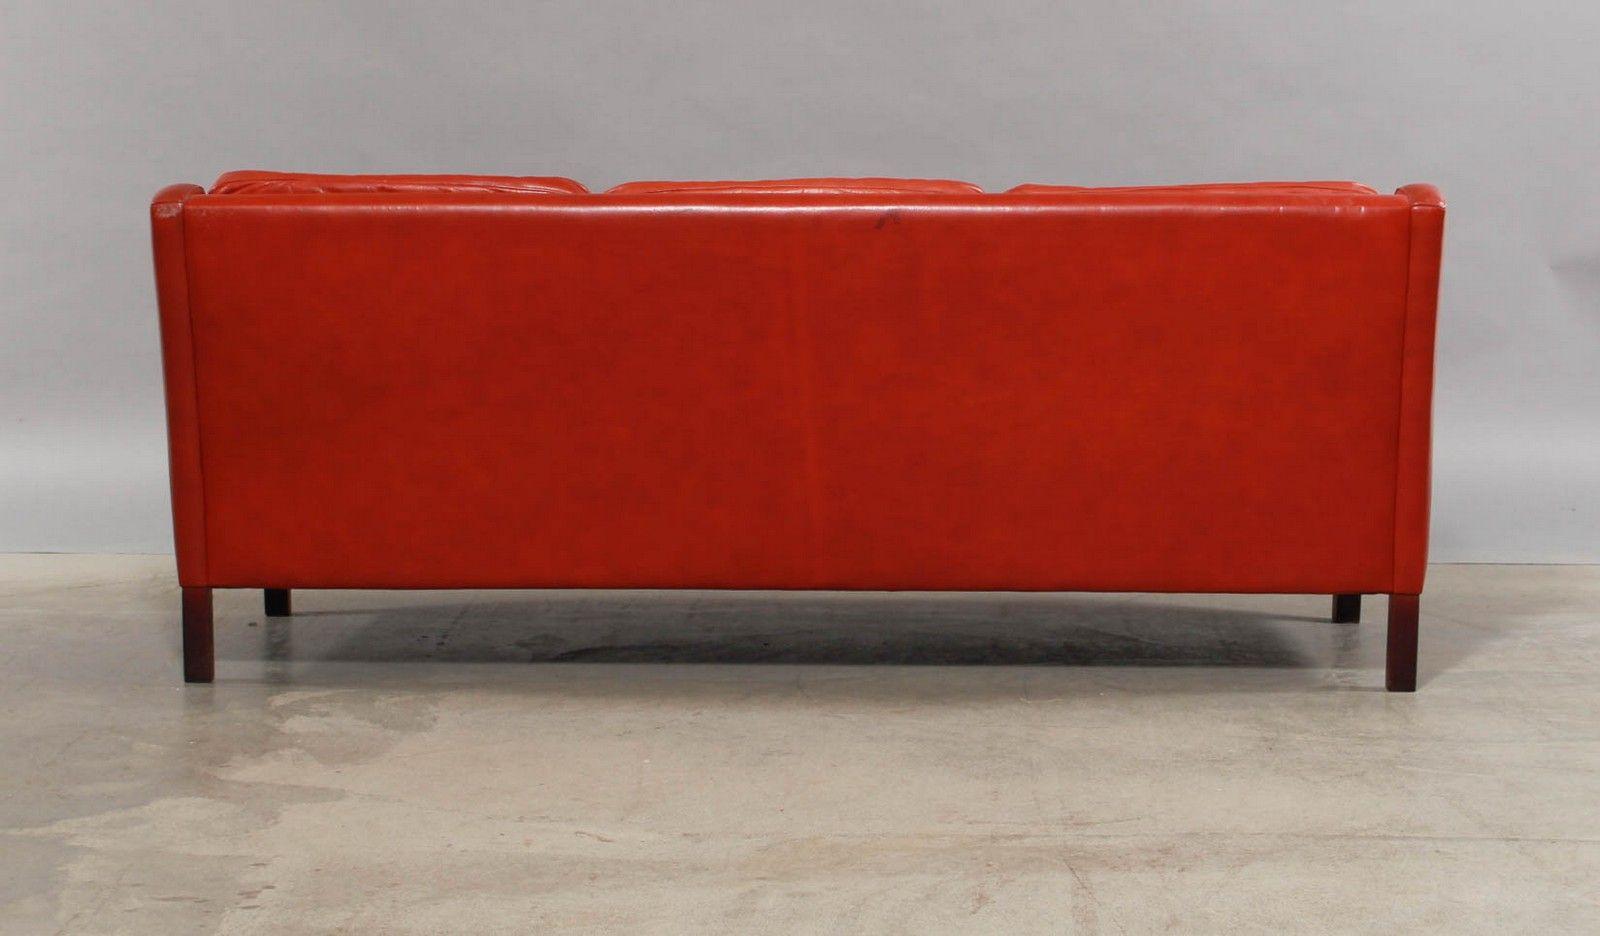 rotes skandinavisches vintage 3 sitzer ledersofa bei. Black Bedroom Furniture Sets. Home Design Ideas